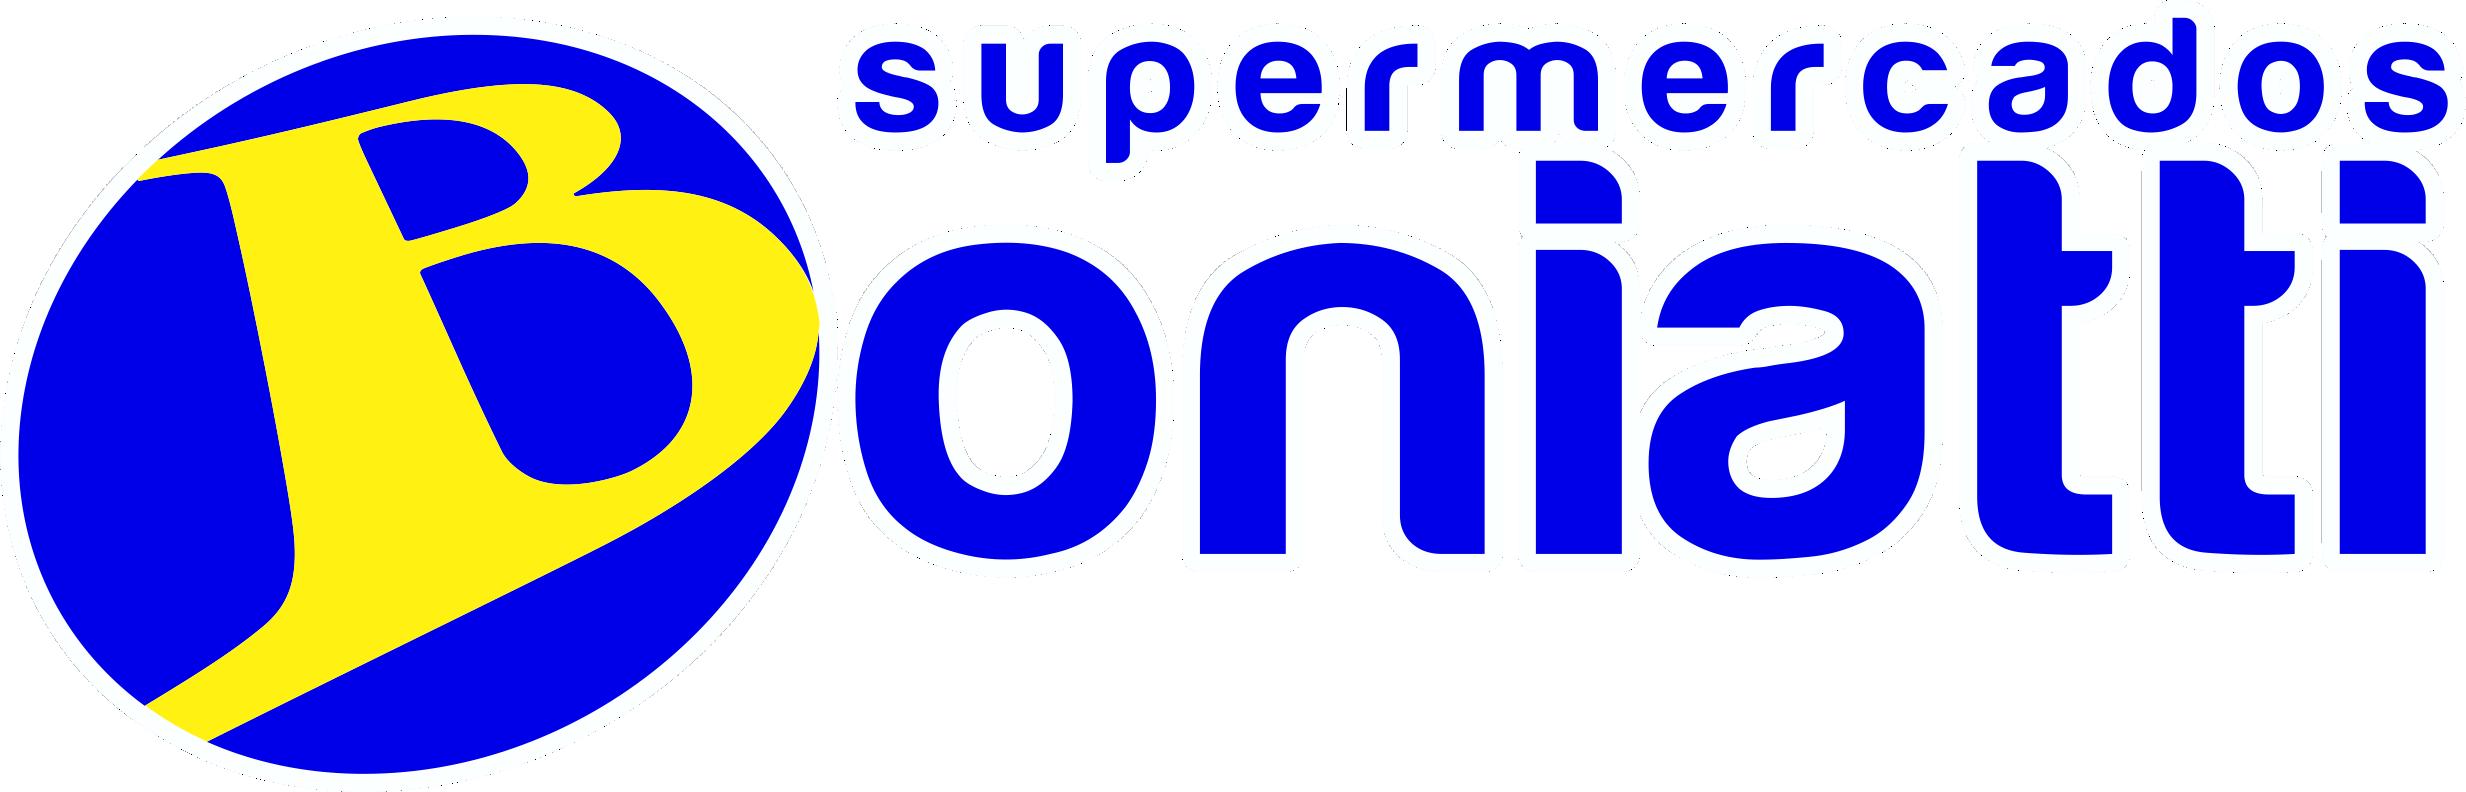 LOGO BONIATTI X5